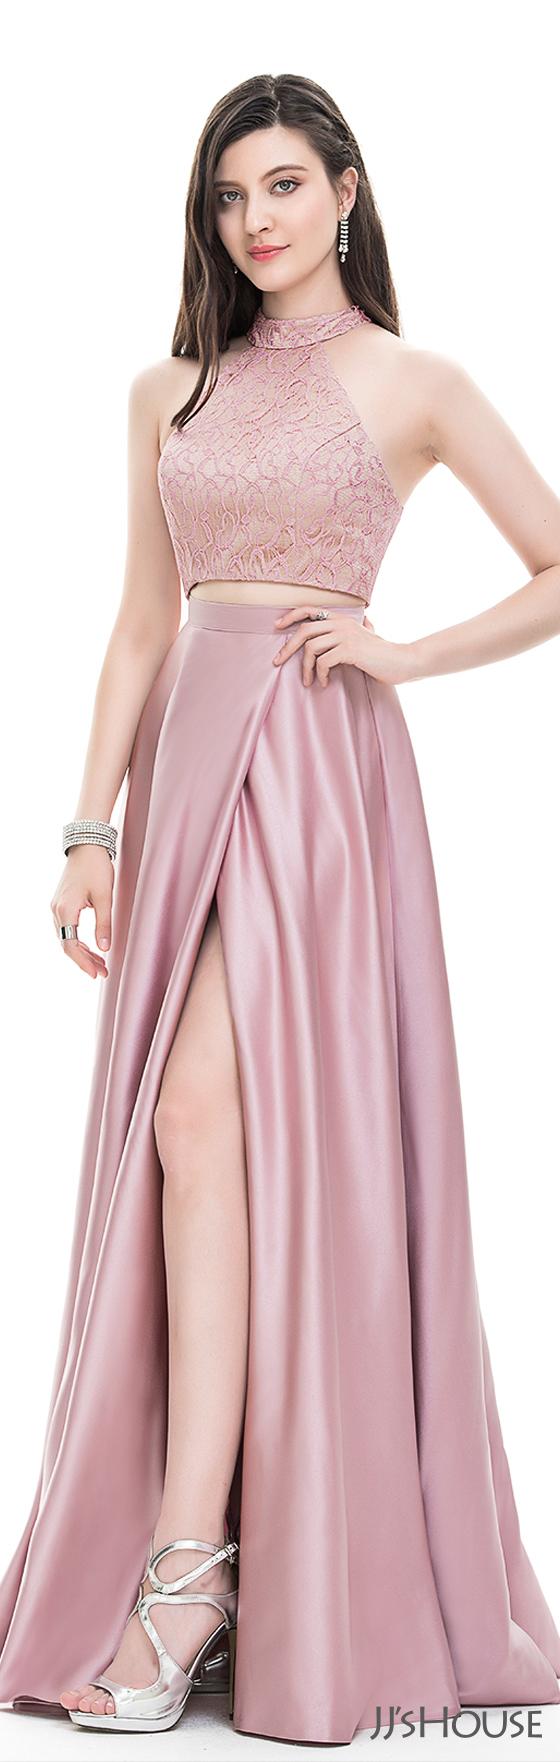 JJsHouse #Prom | Fiestas | Pinterest | Vestiditos, Vestidos de ...